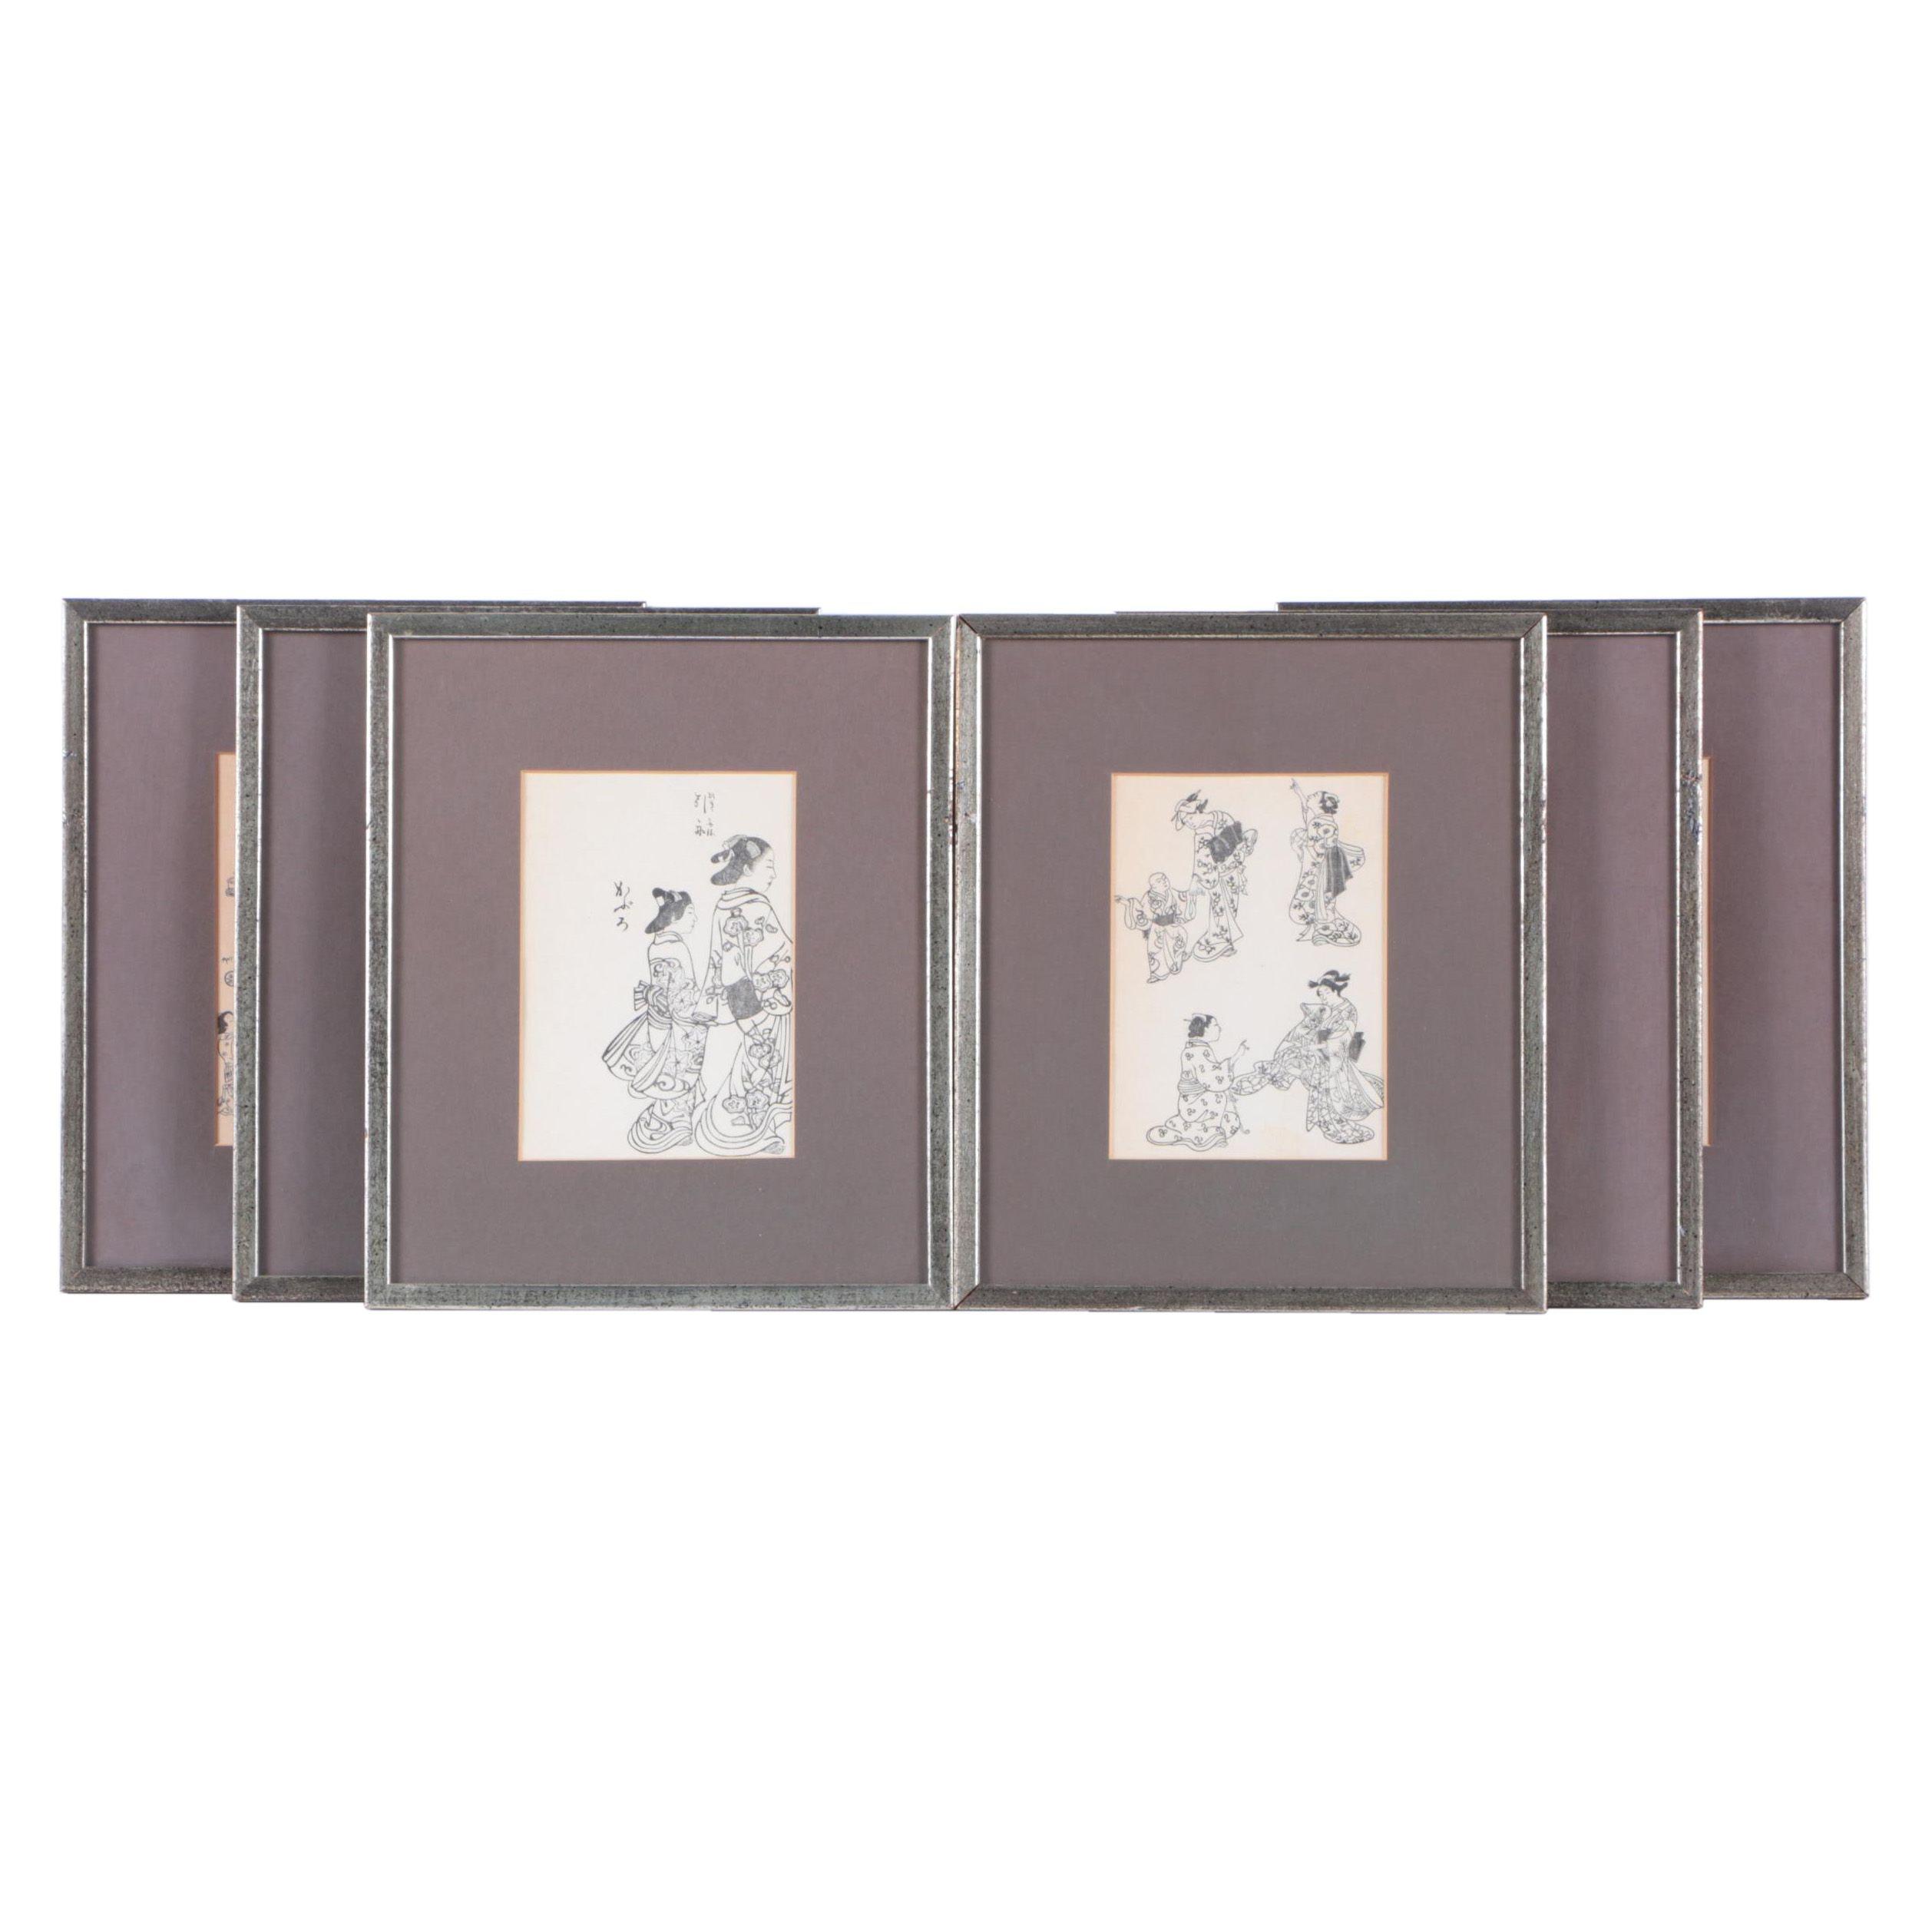 Six East Asian Style Woodblock Prints of Women